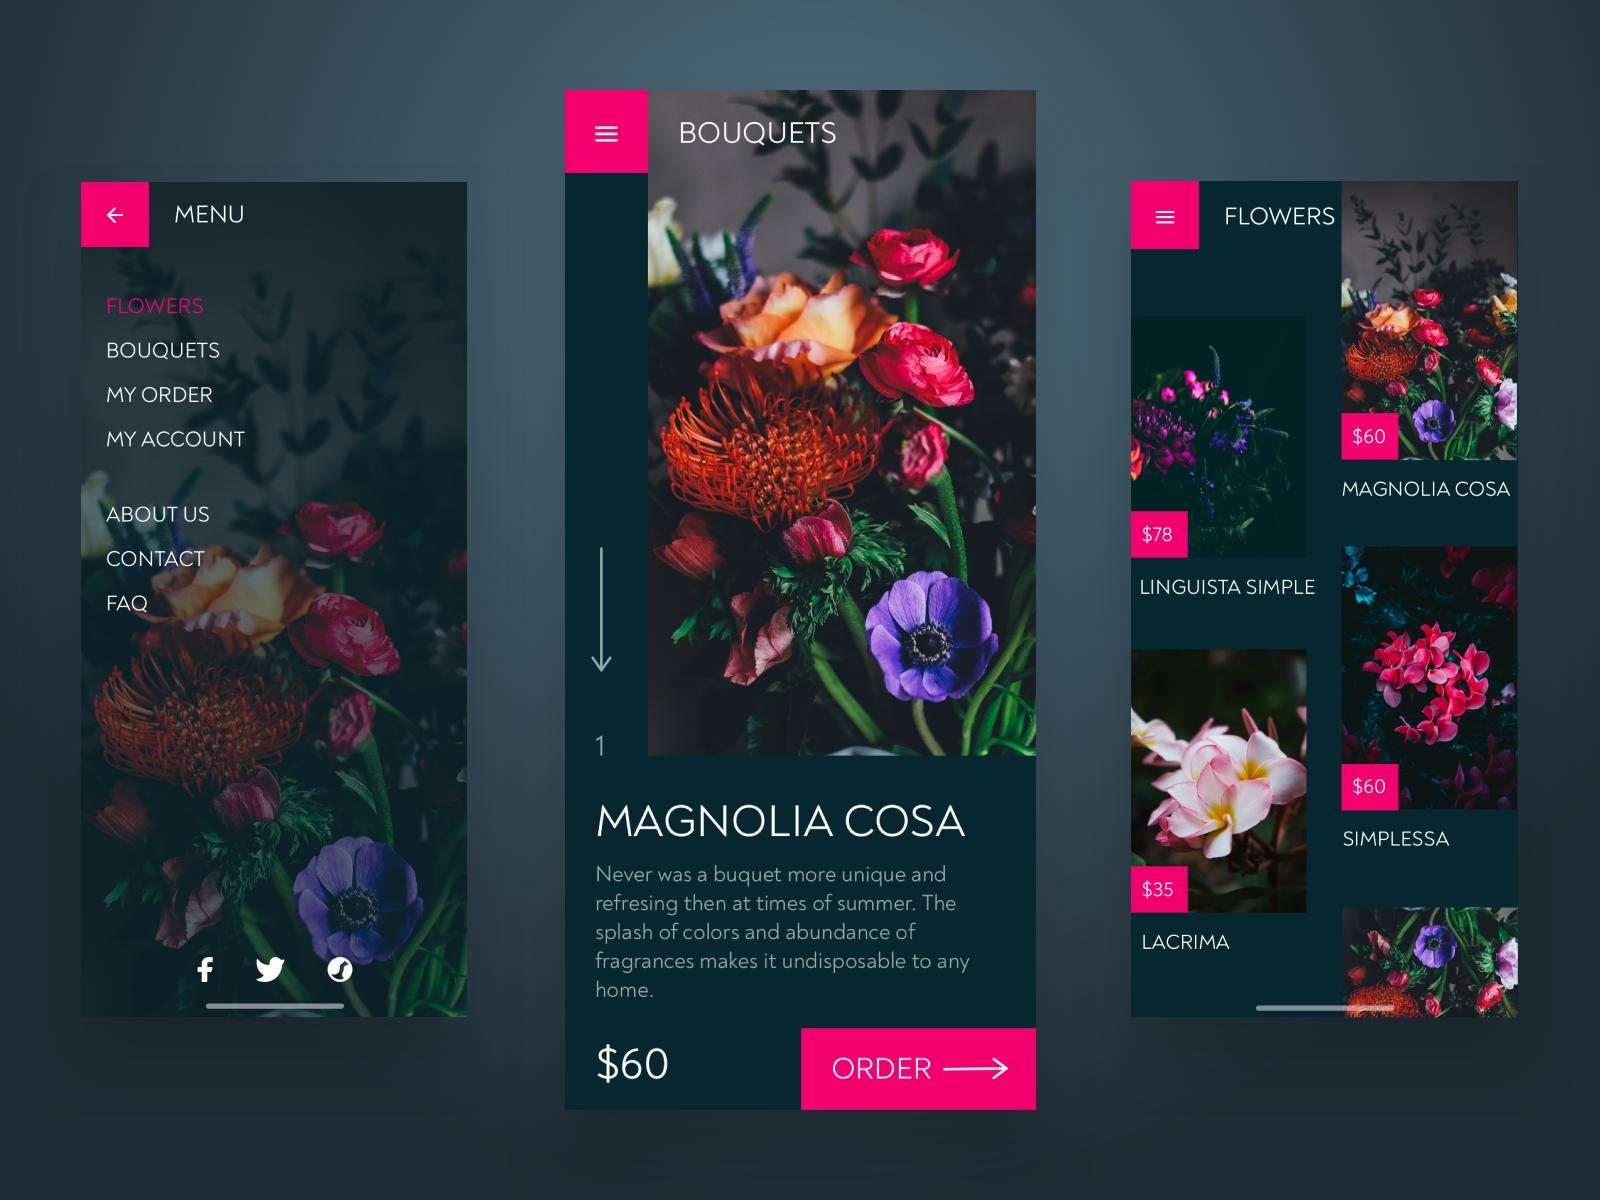 Dark Flower Shop App By Katalin Balint For Halcyon Mobile On Dribbble